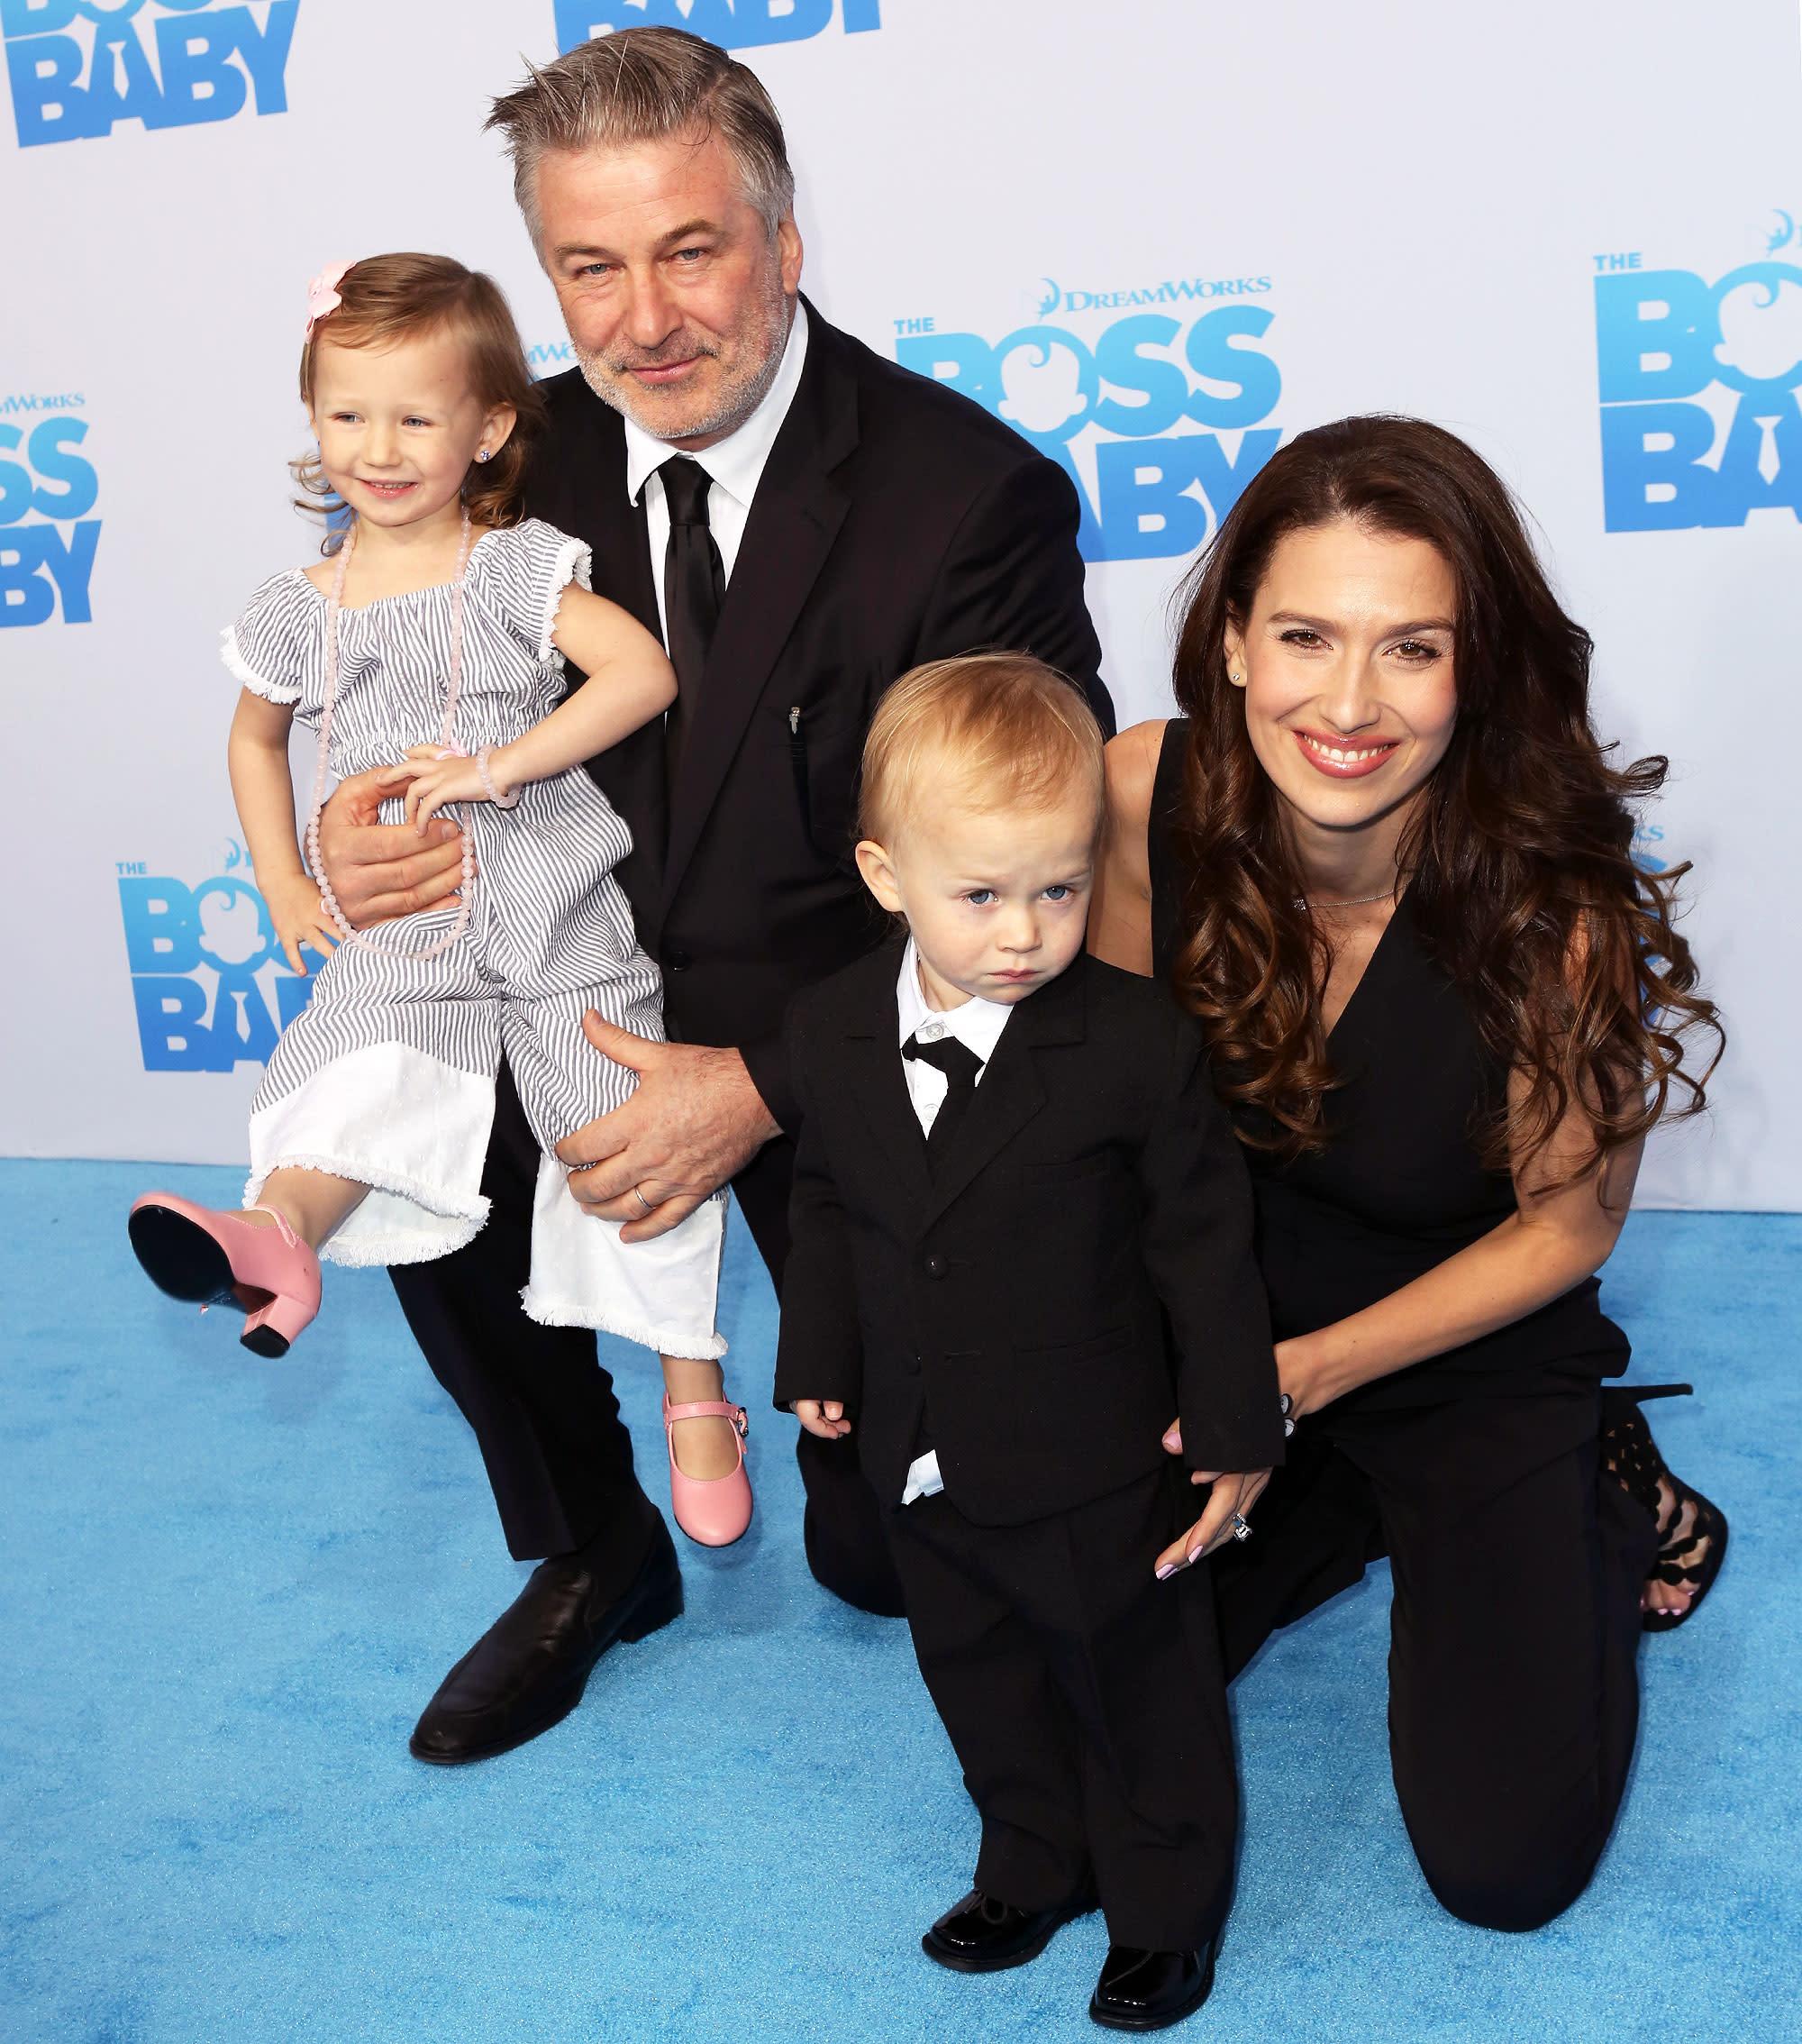 Alec Baldwin Has His Very Own Boss Baby: His Son, Rafael!